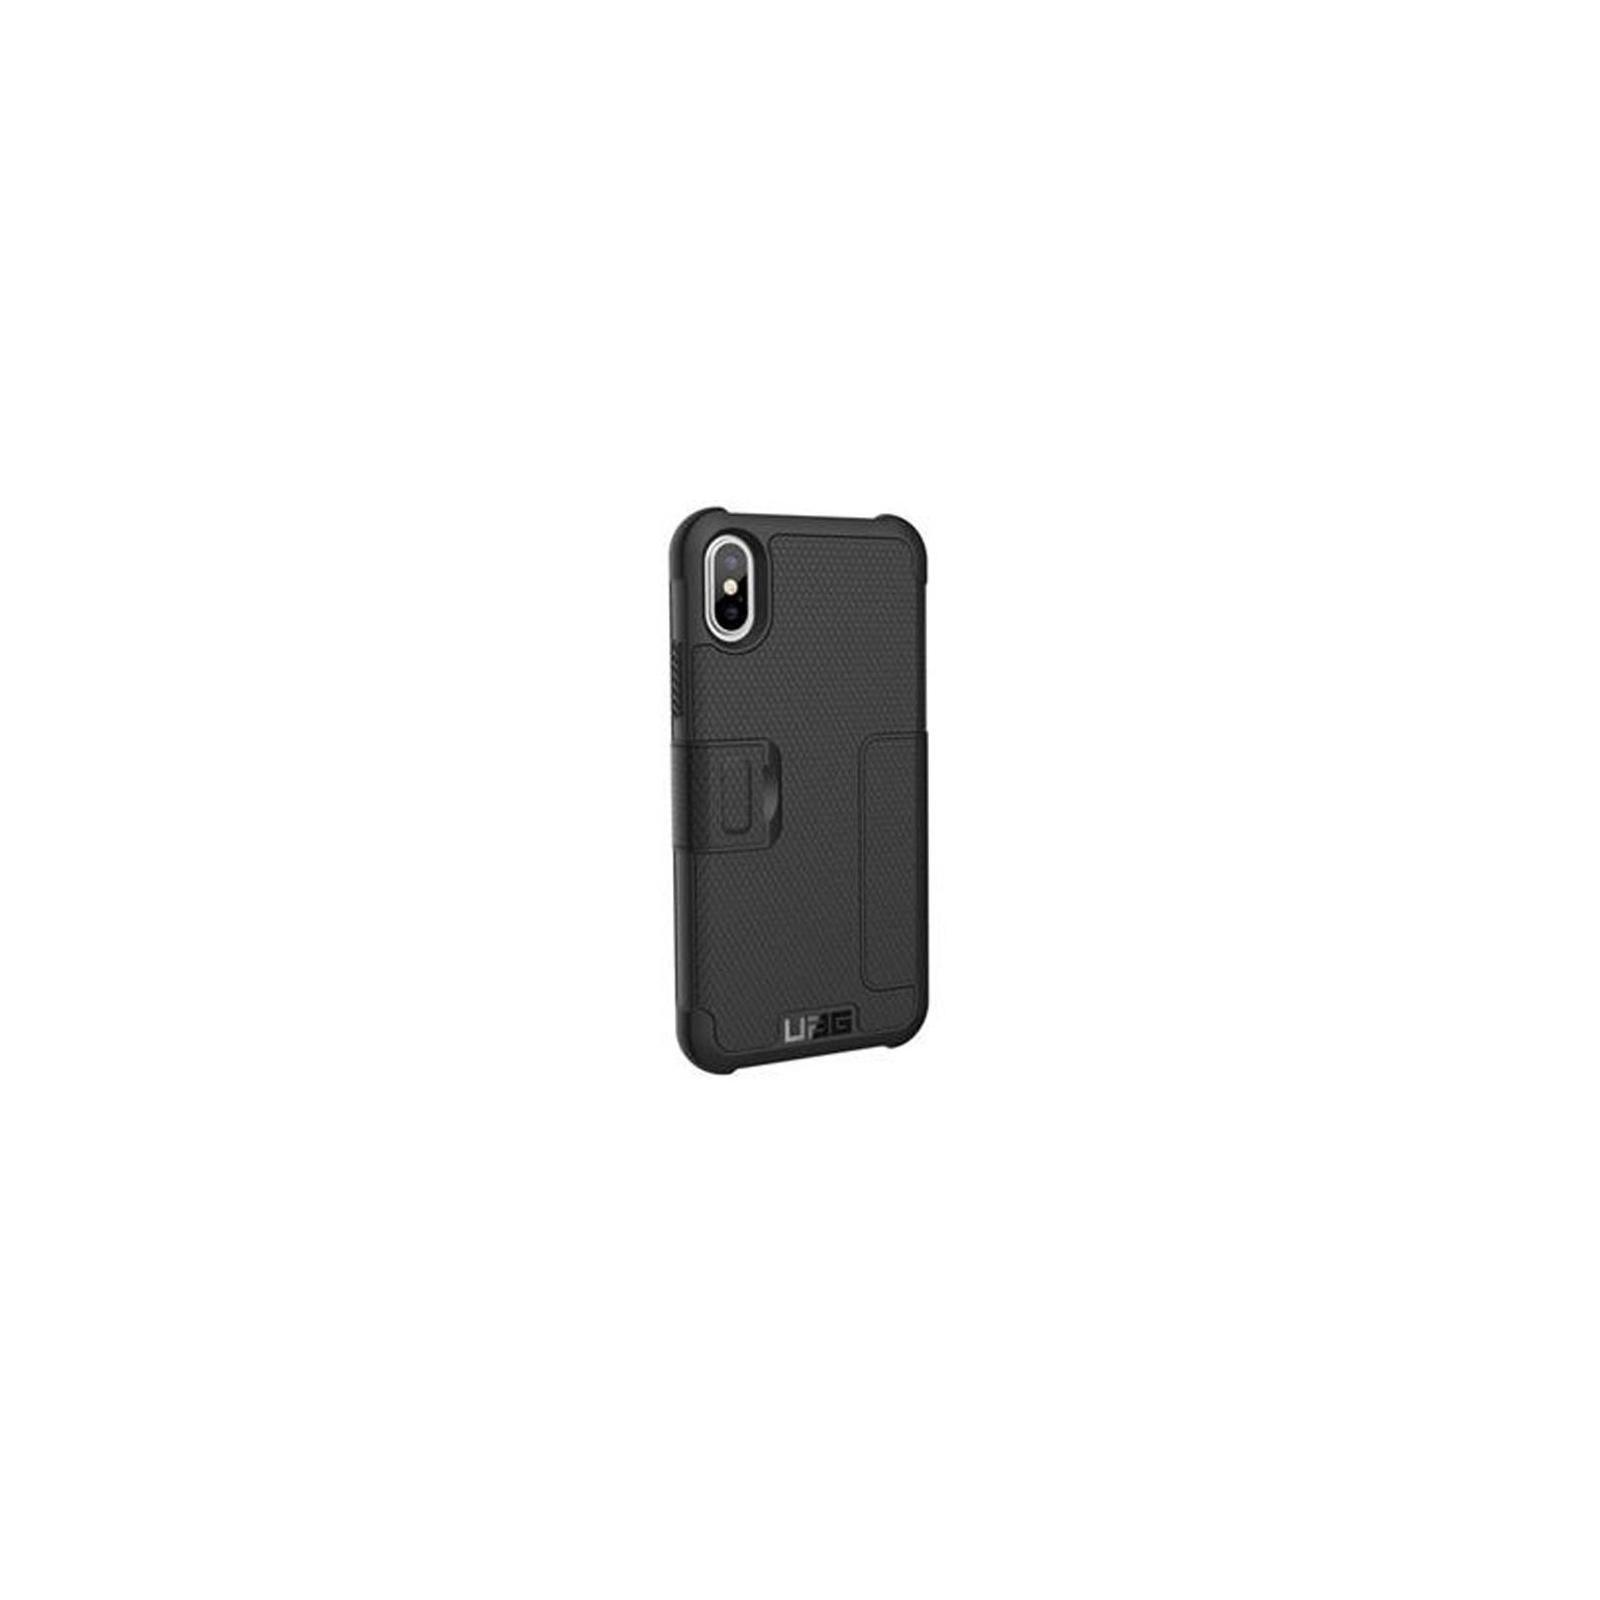 Чехол для моб. телефона Uag iPhone X Metropolis Black (IPH8-E-BL) изображение 3